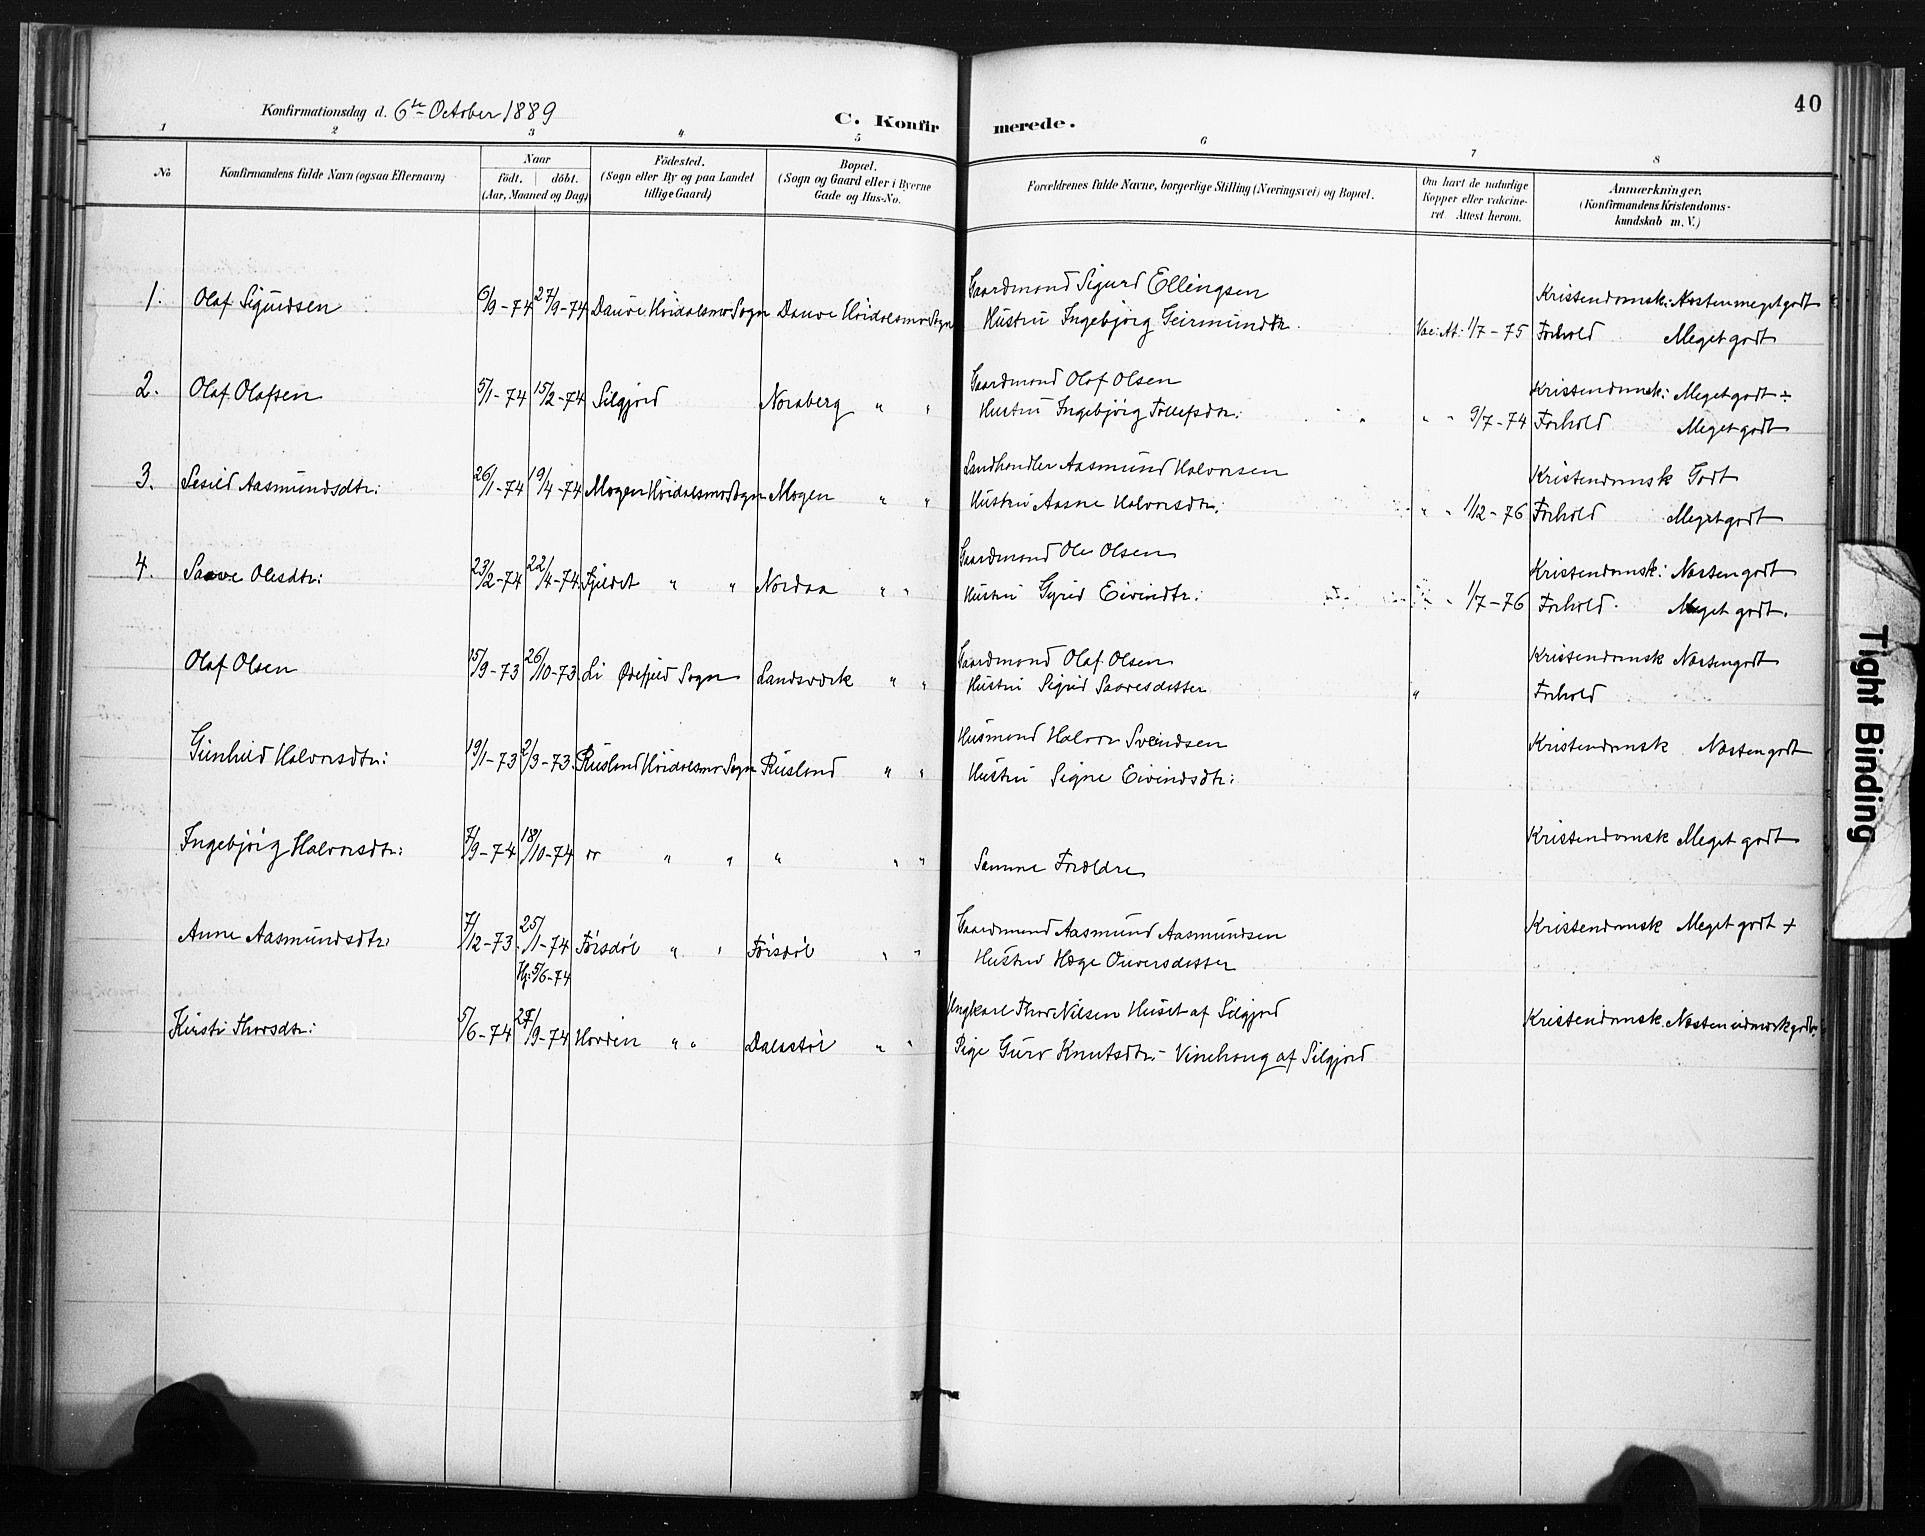 SAKO, Lårdal kirkebøker, F/Fc/L0002: Ministerialbok nr. III 2, 1887-1906, s. 40